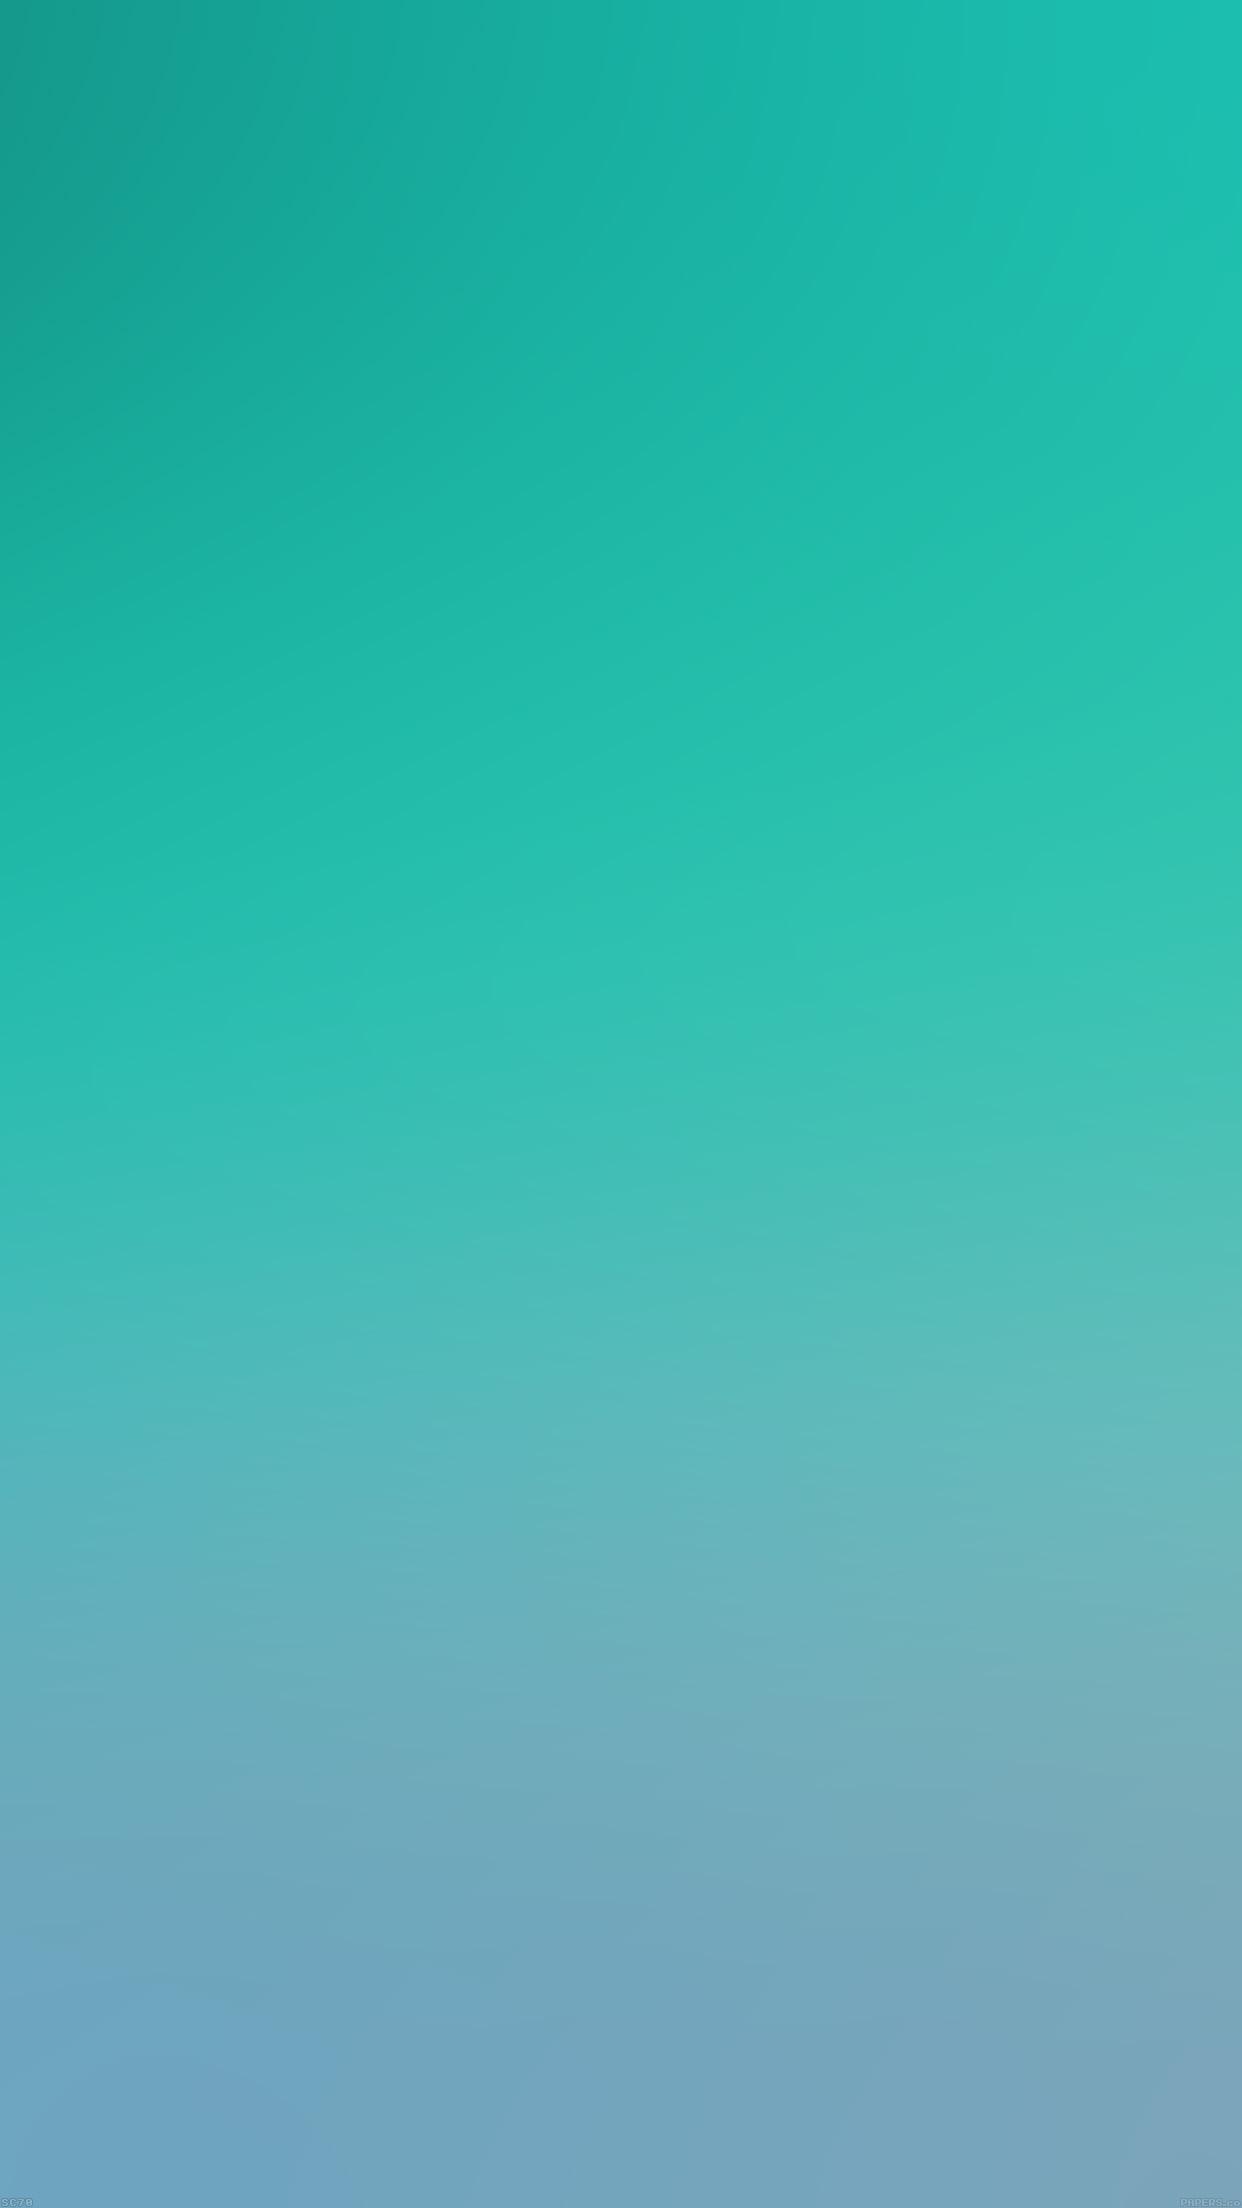 fr201411085 wallpapers blur iphone 6 plus iphone 6 ipad air etc 1242x2208